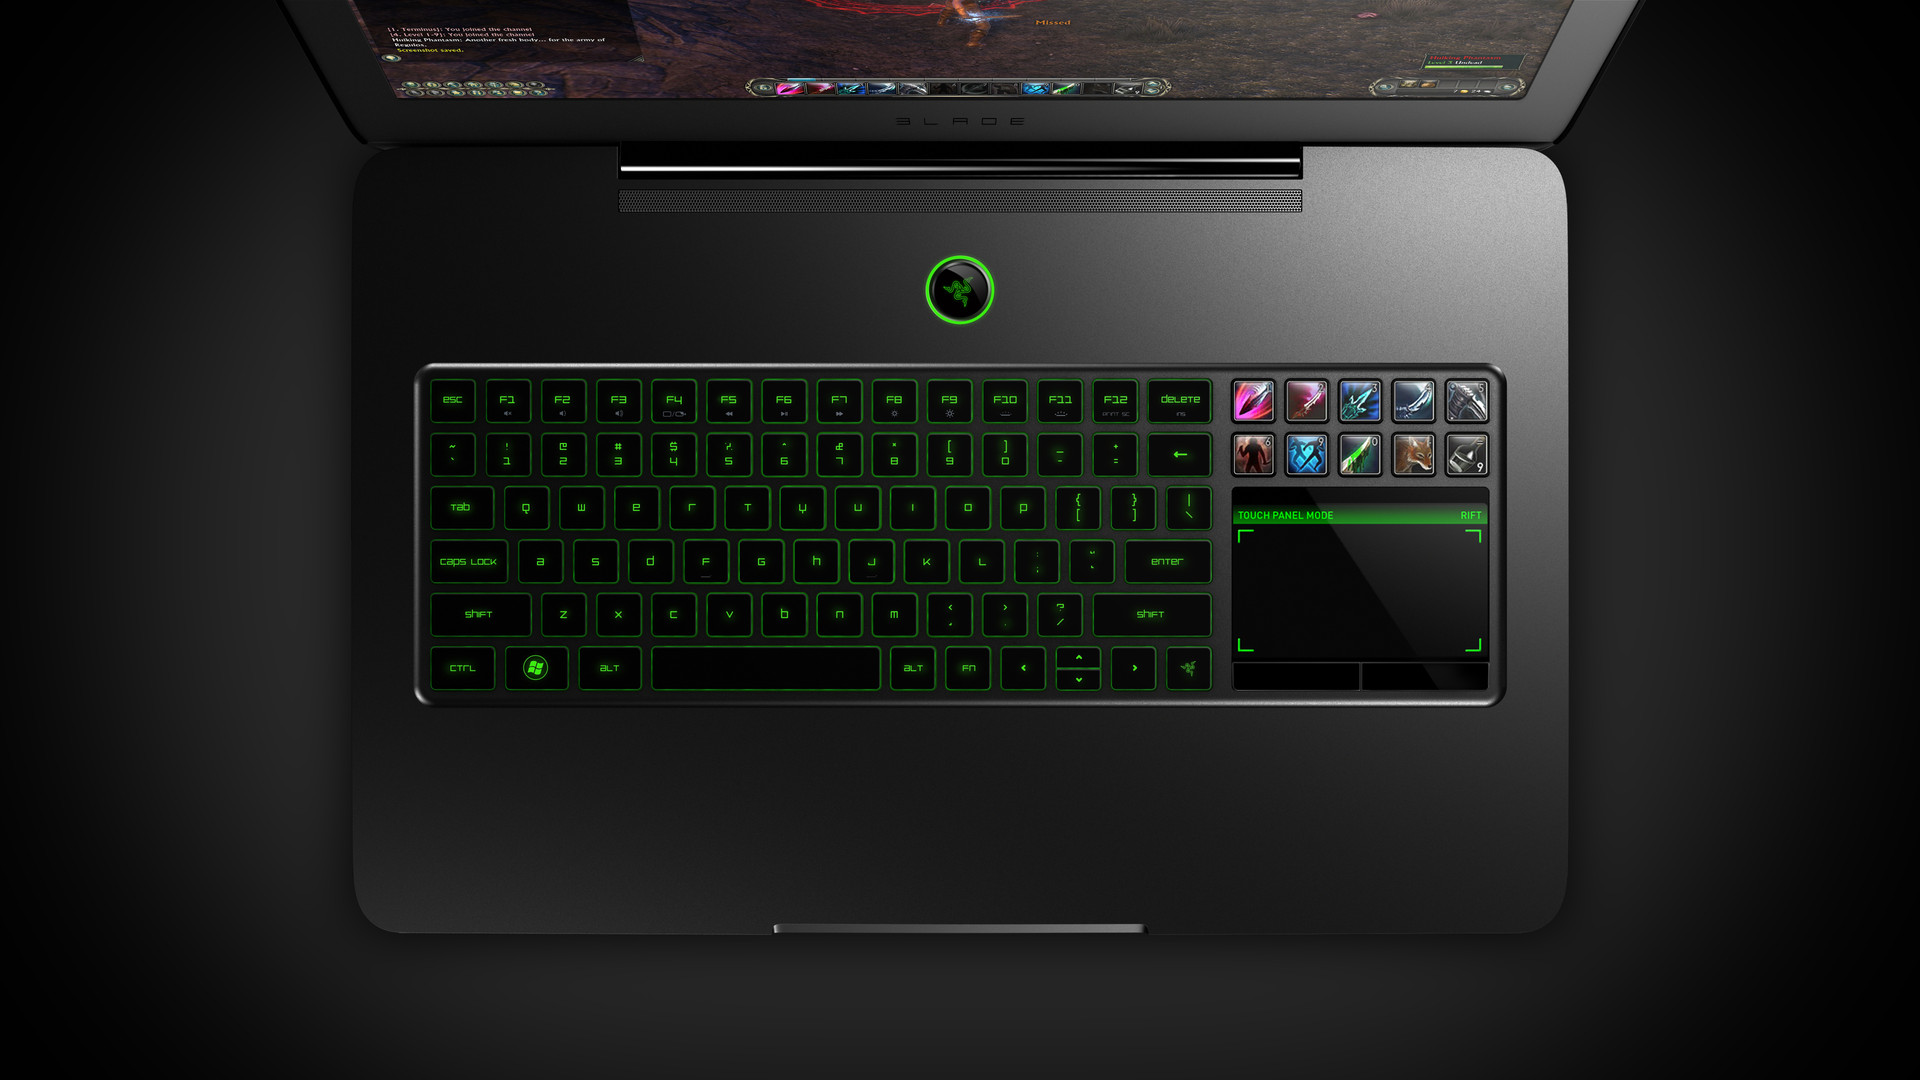 Razer Blade gaming laptop: Initial impressions ...